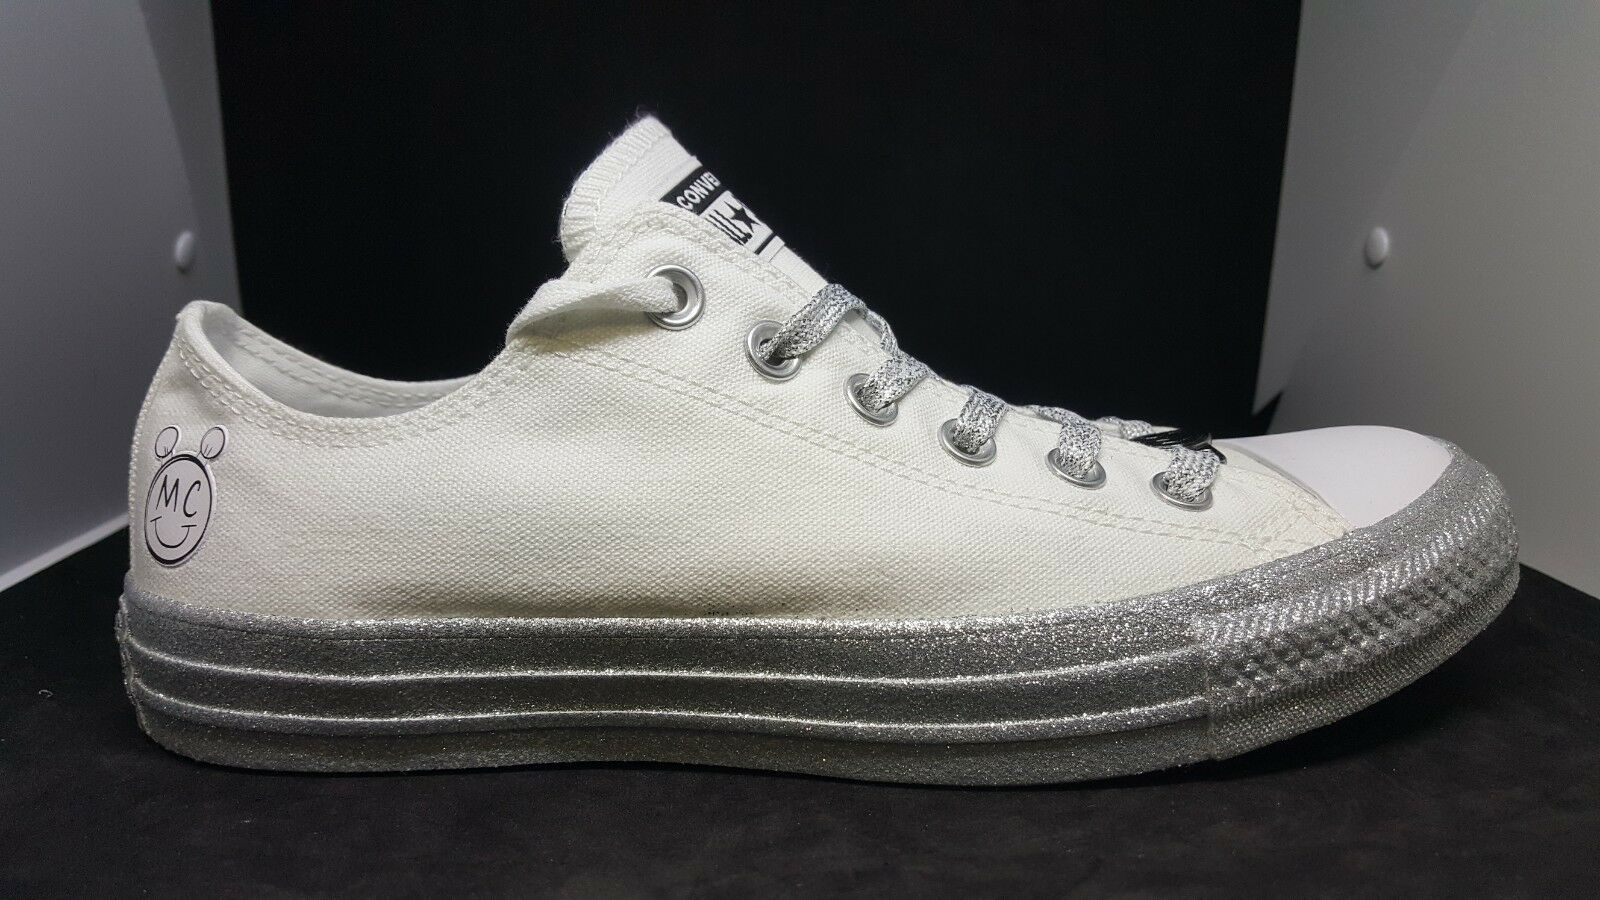 Converse Miley Cyrus Chuck Taylor low Weiß Silber 162238C Größe 8.5